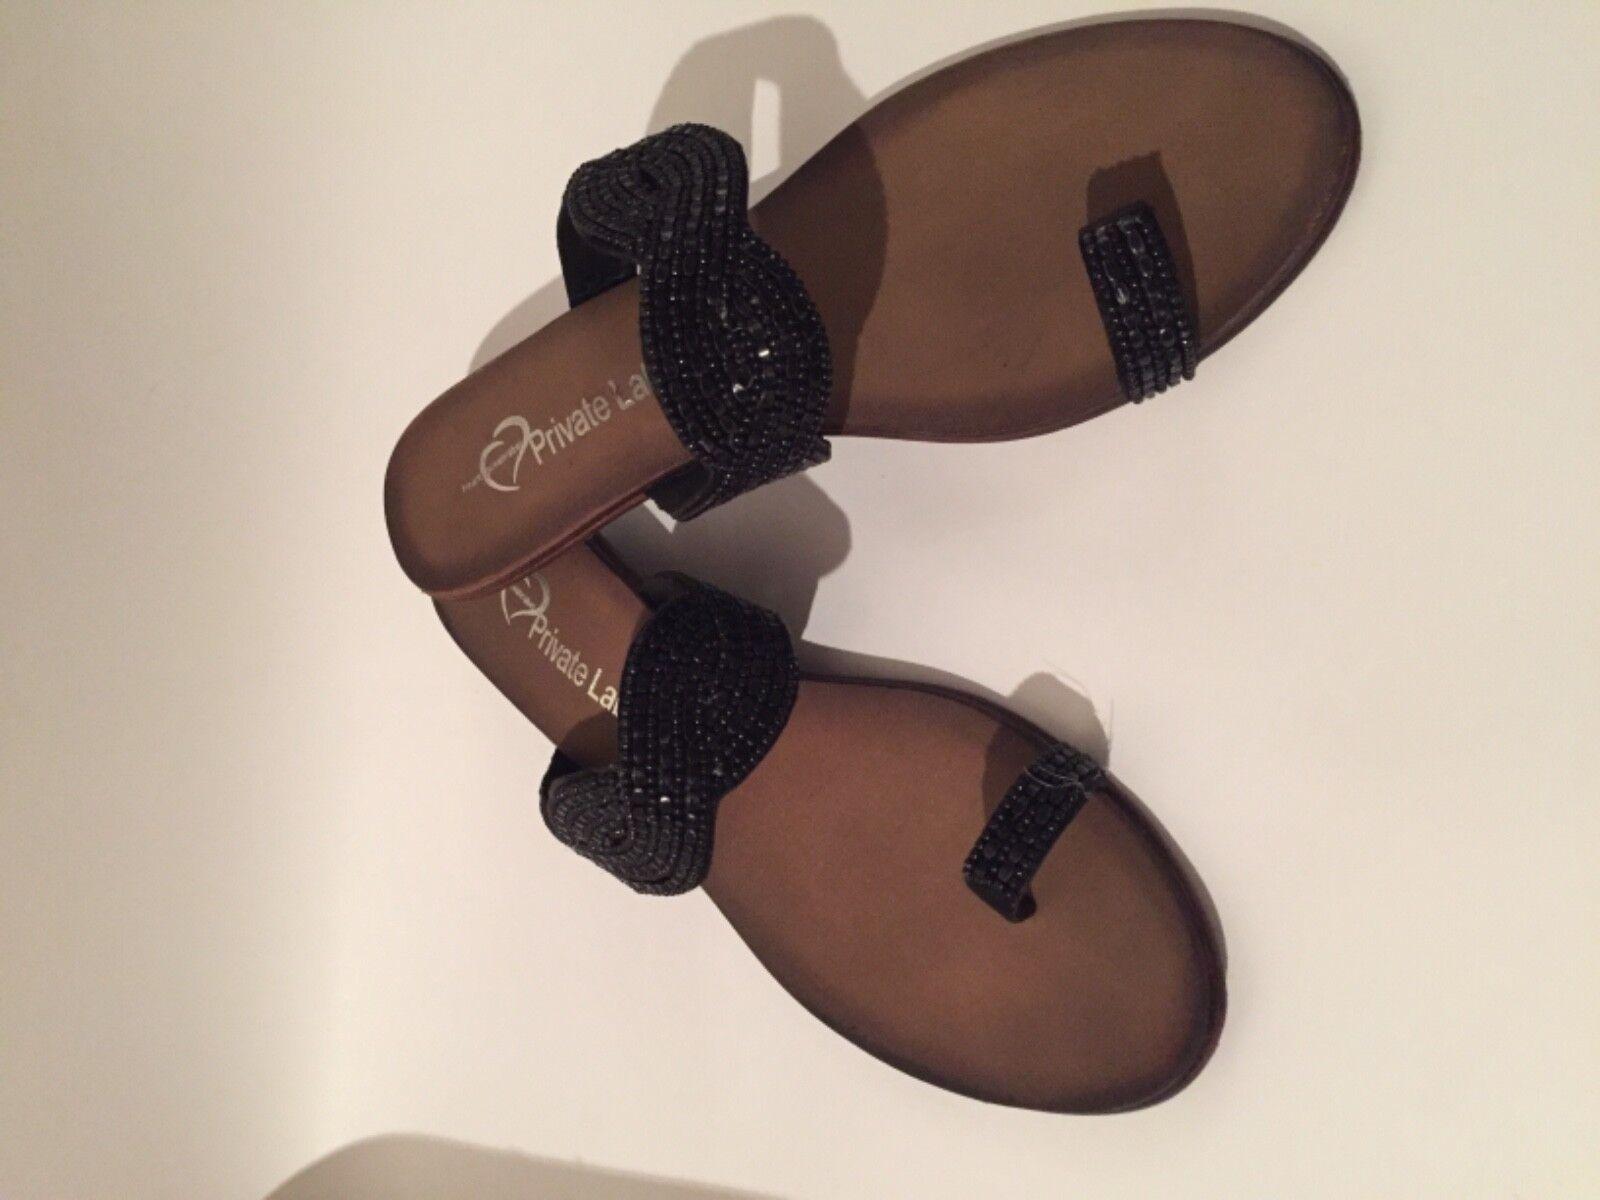 schuhe schuhe PRIVATE LABEL Gipsy 38 choo sexy sandalo sandalo sandalo mare capri caprese batik dabfbb